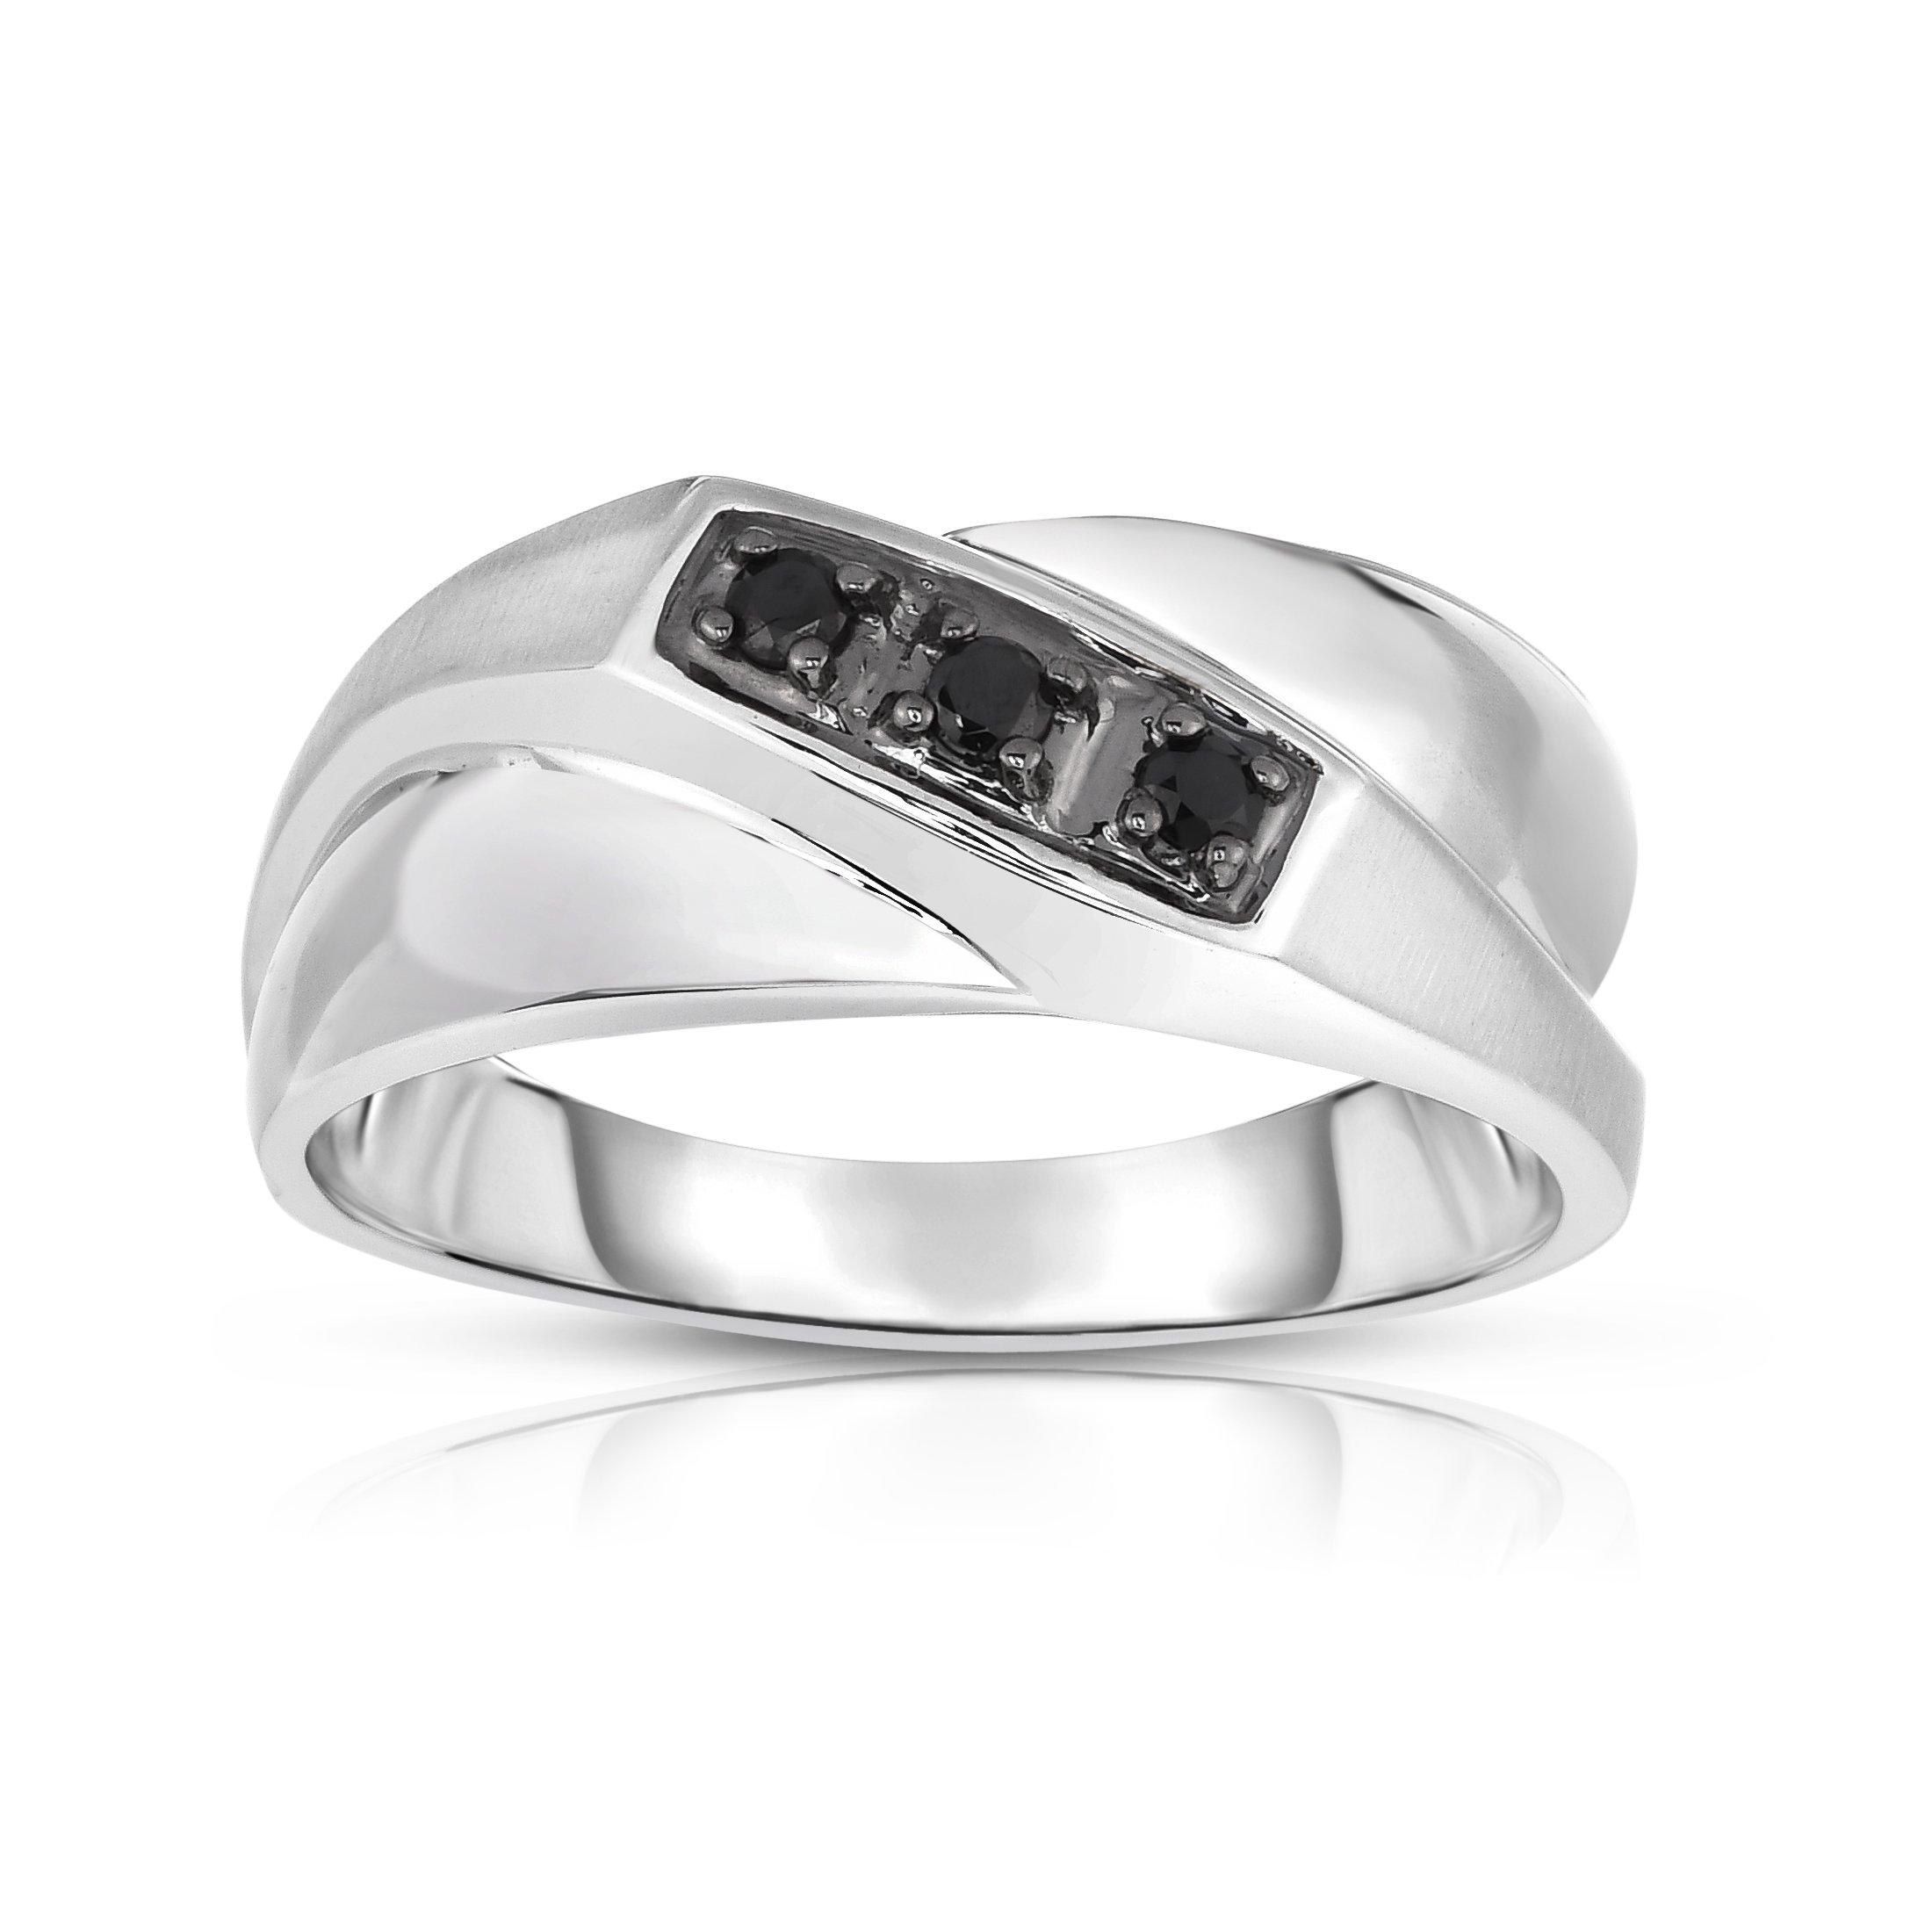 Noray Designs 14K White Gold Black Diamond (0.18 Ct, I1-I2 Clarity, Black Color) Men's 3-Stone Ring